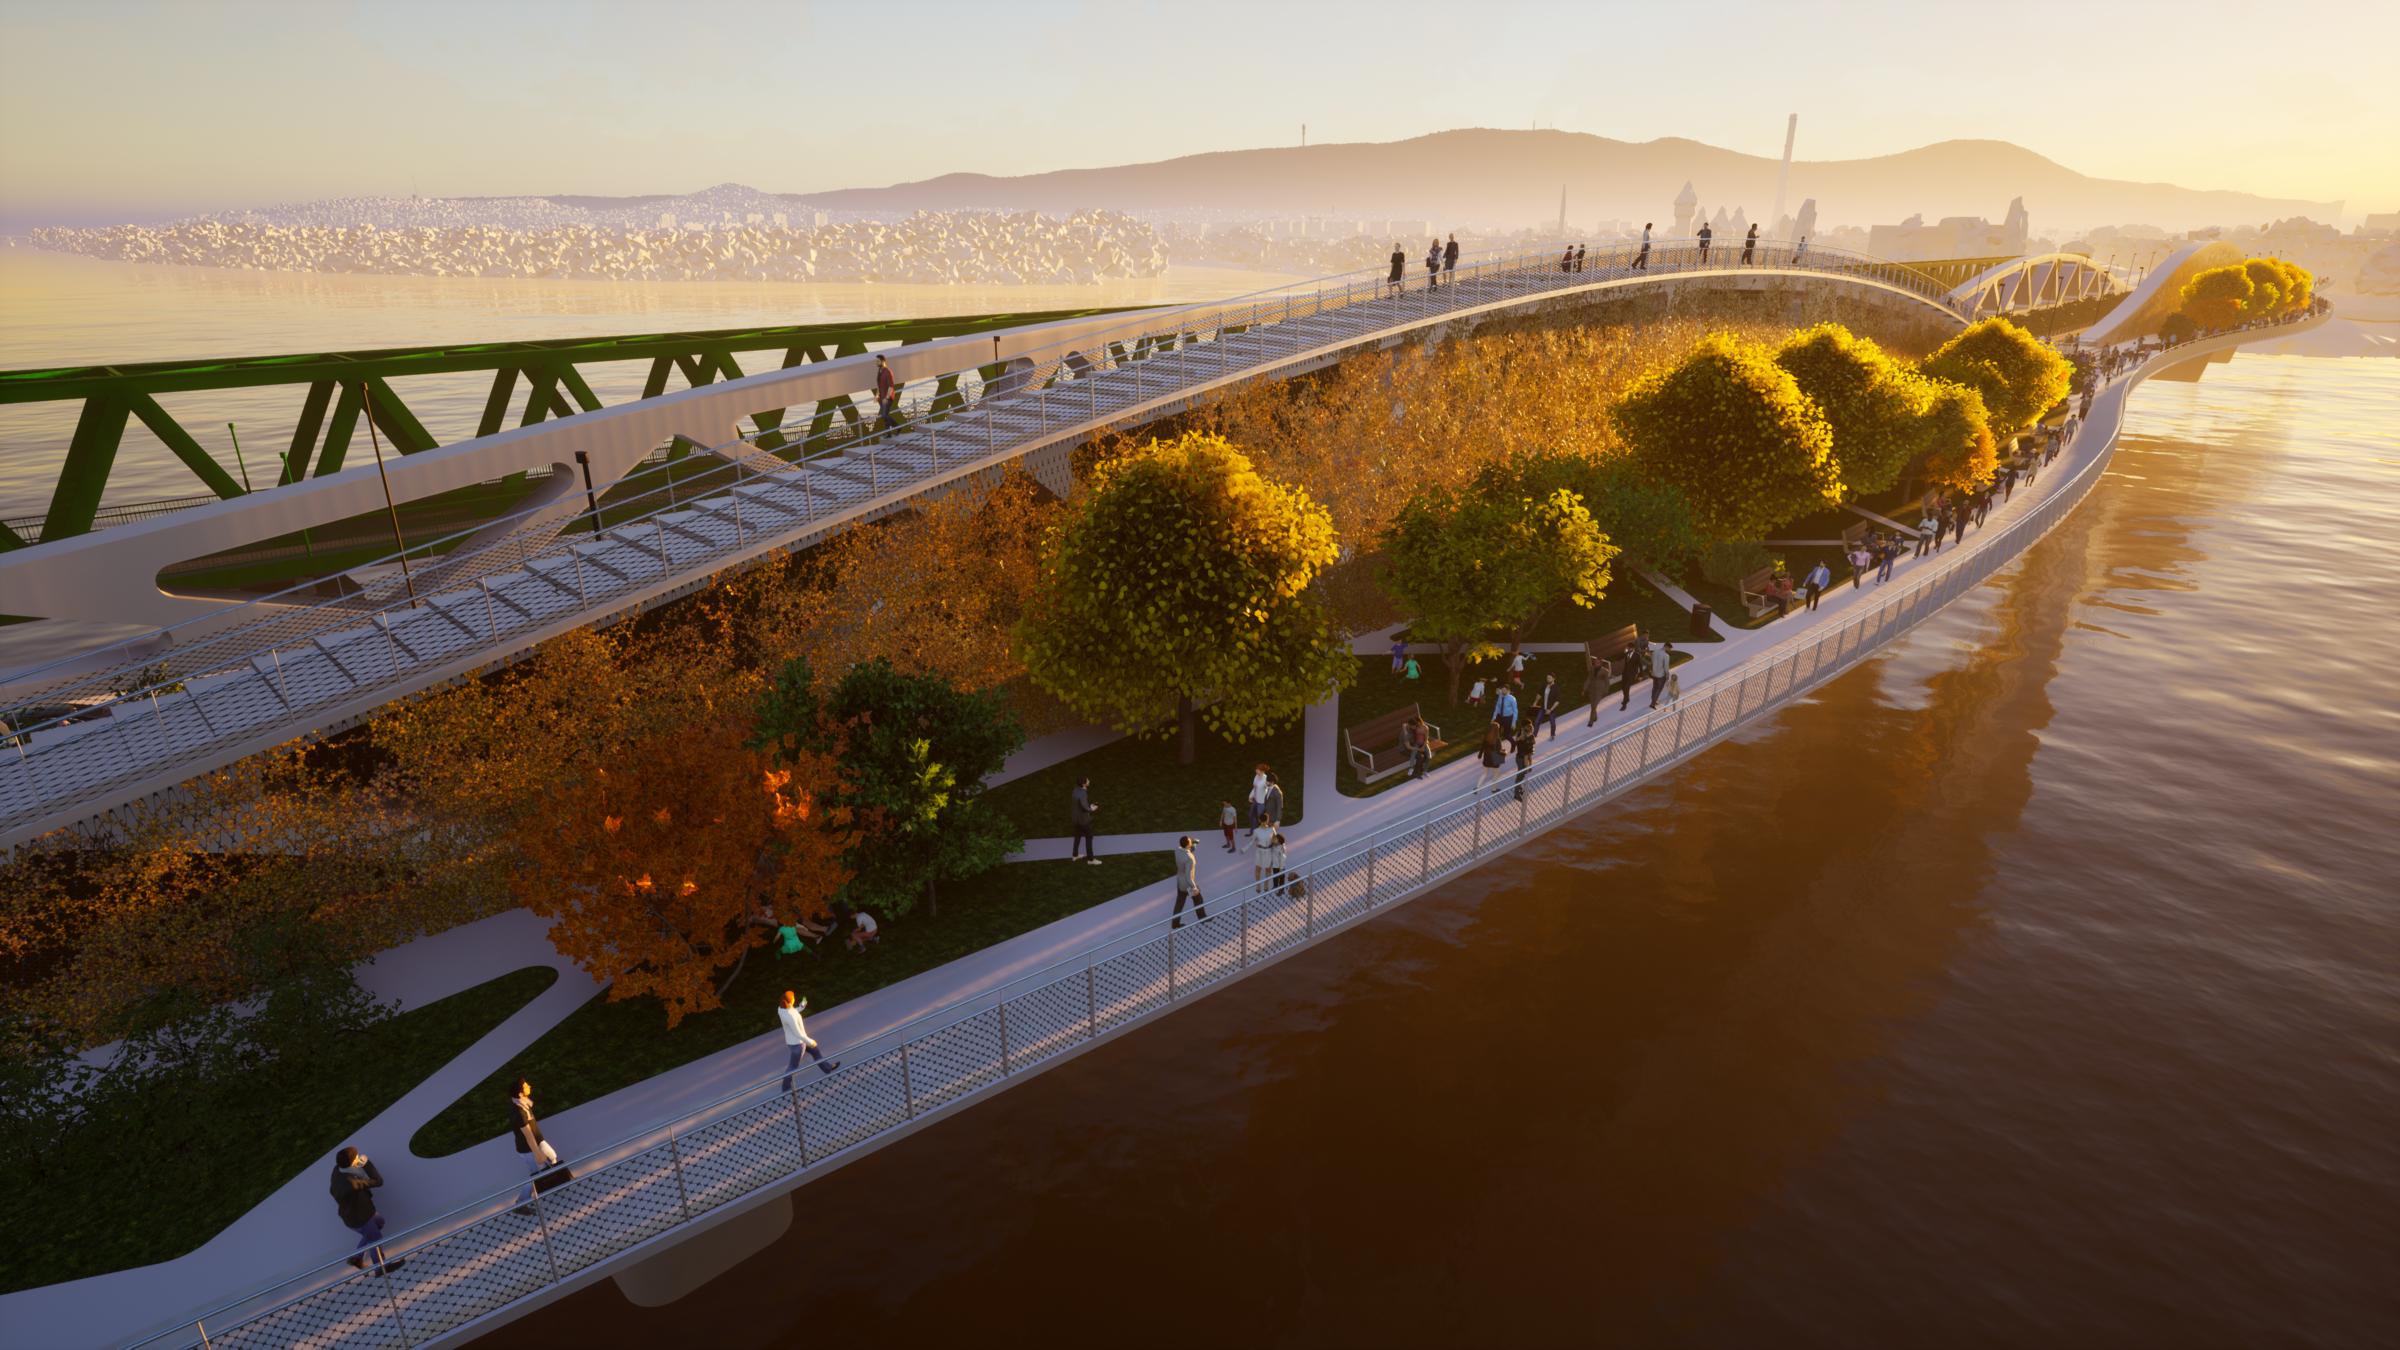 The 'green' bridge